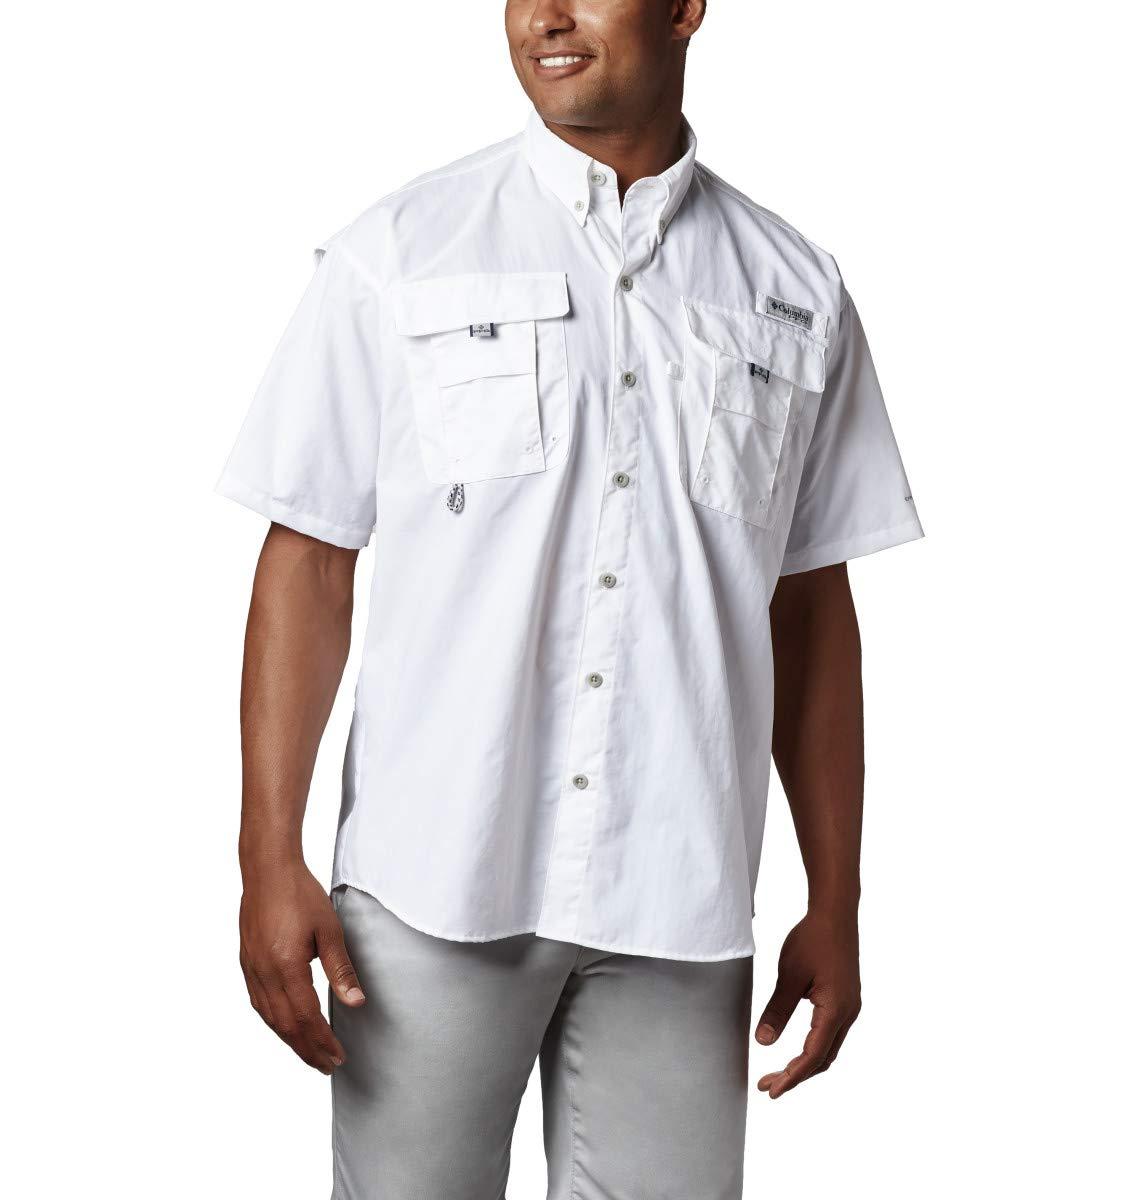 Columbia Men's PFG Bahama II Short Sleeve Shirt, White, Large